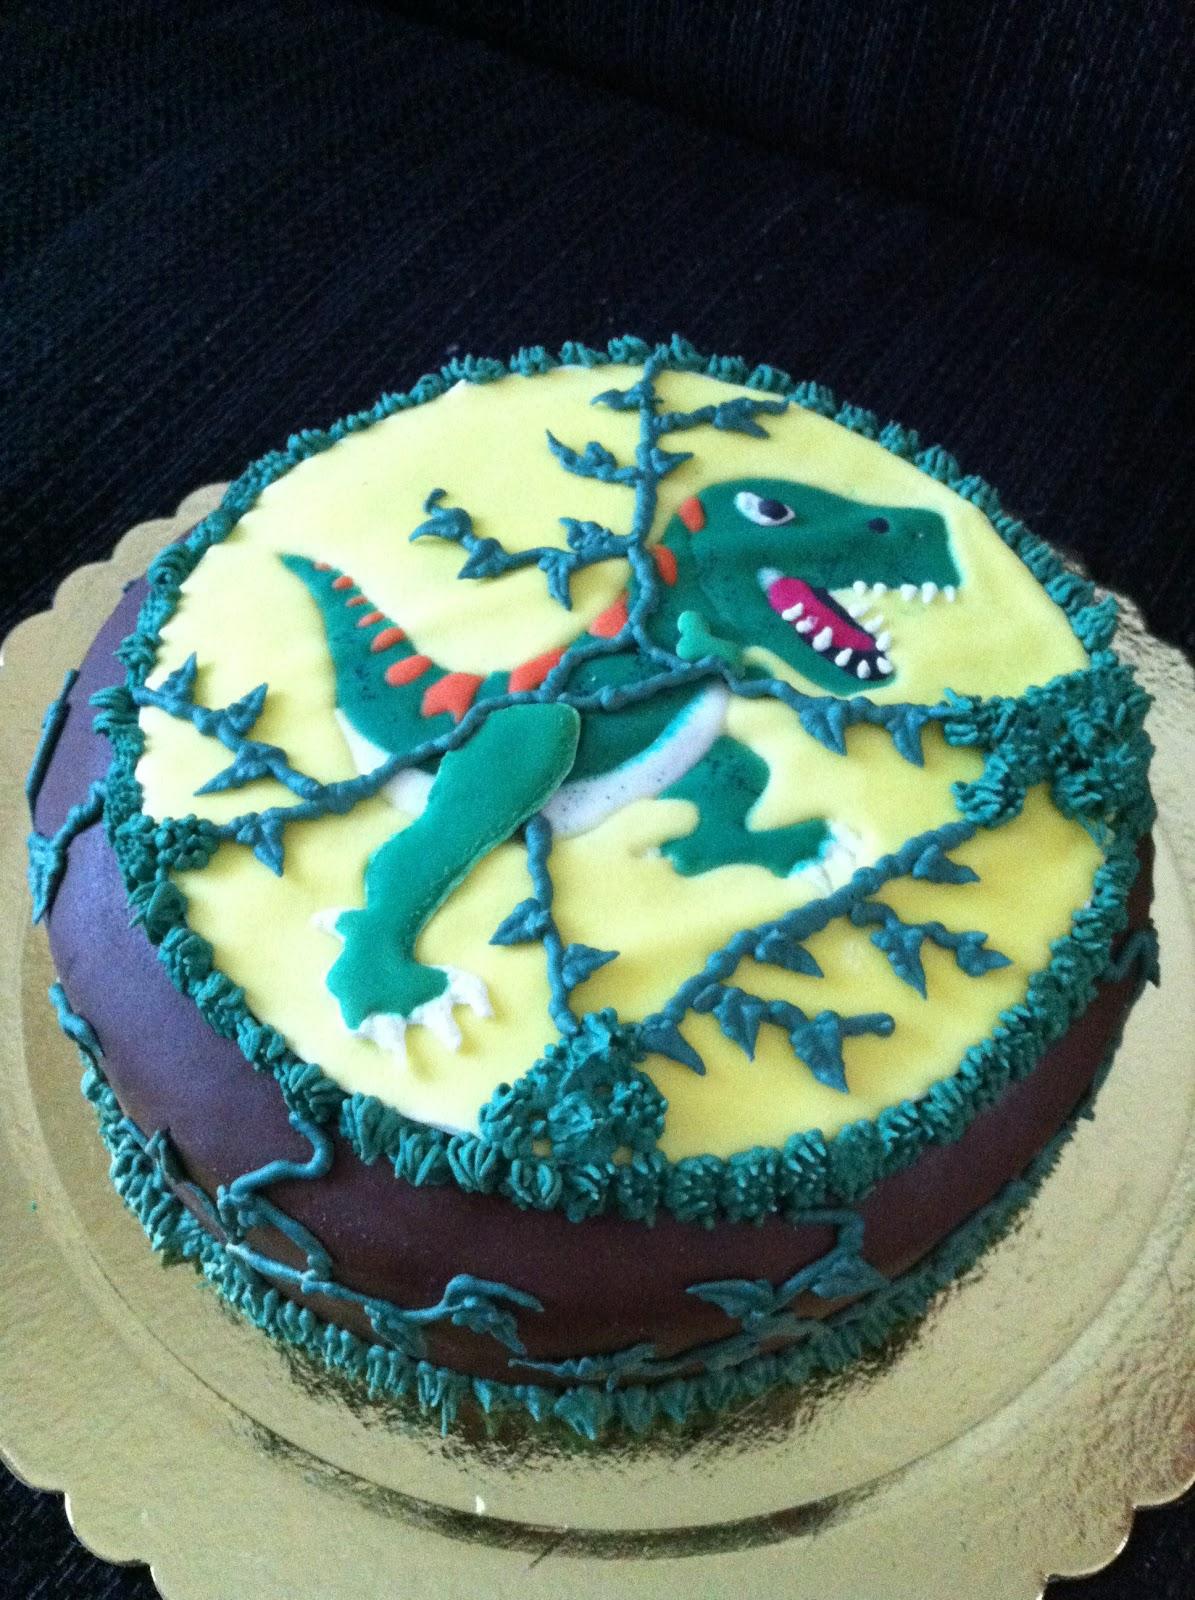 le due torte bologna torta tyrannosaurus rex